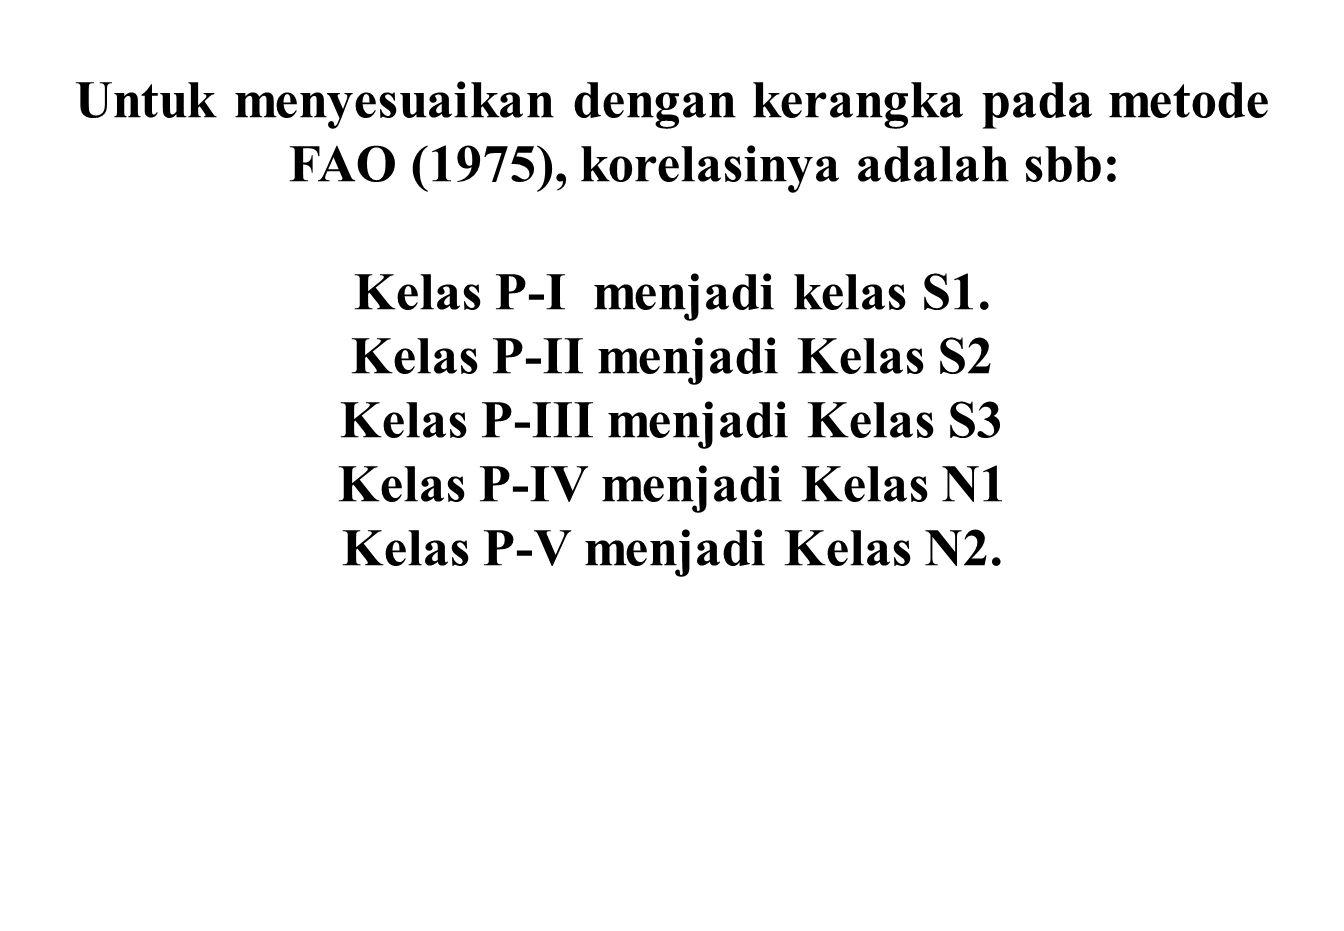 Untuk menyesuaikan dengan kerangka pada metode FAO (1975), korelasinya adalah sbb: Kelas P-I menjadi kelas S1. Kelas P-II menjadi Kelas S2 Kelas P-III